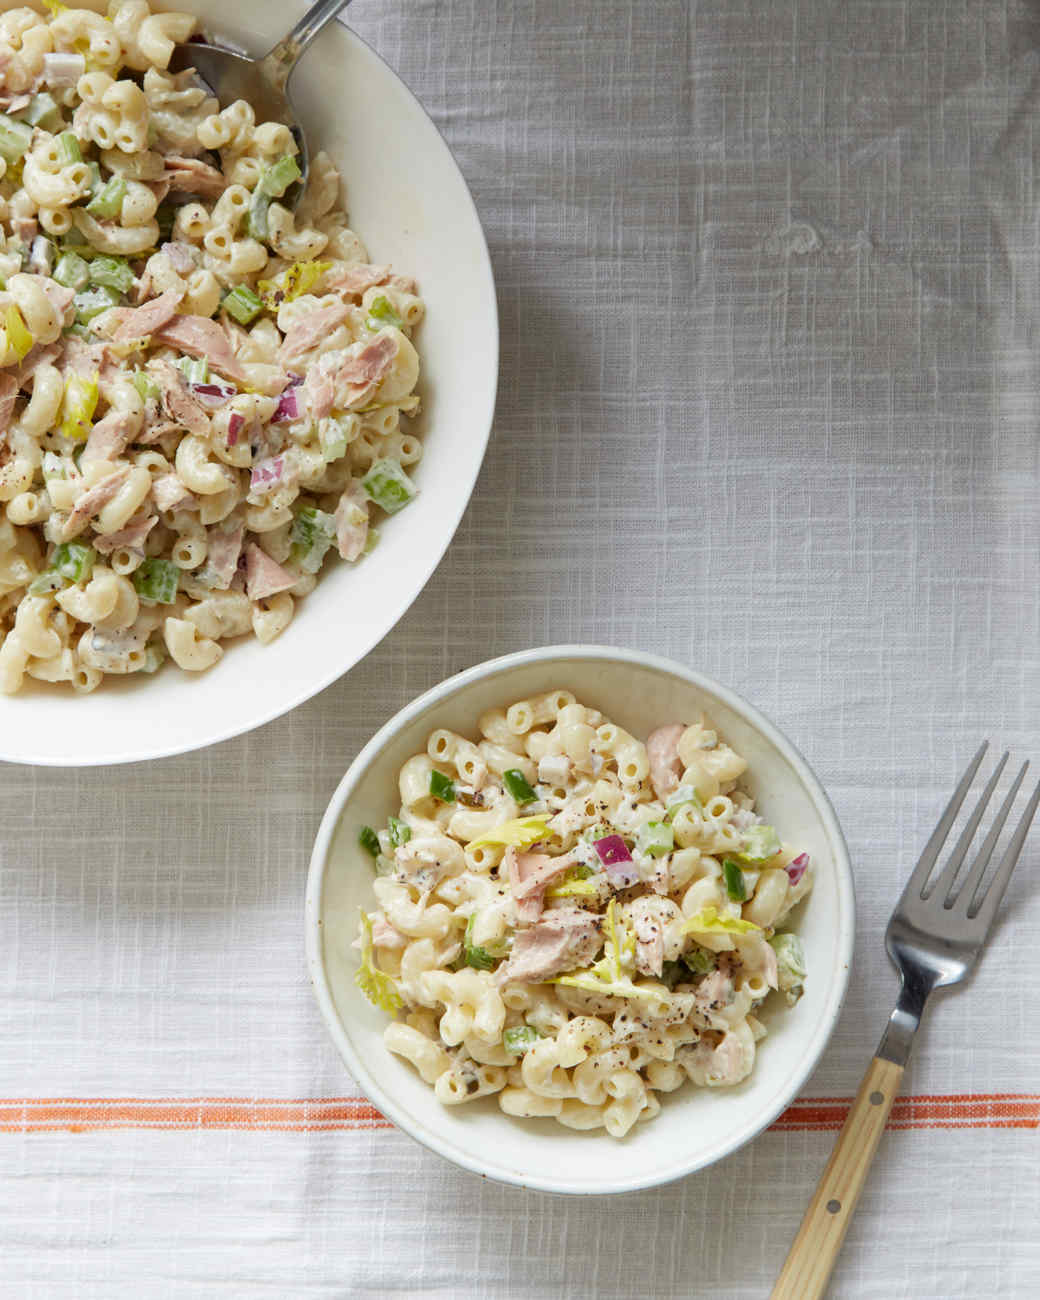 tuna-macaroni-salad-8247-d112977.jpg